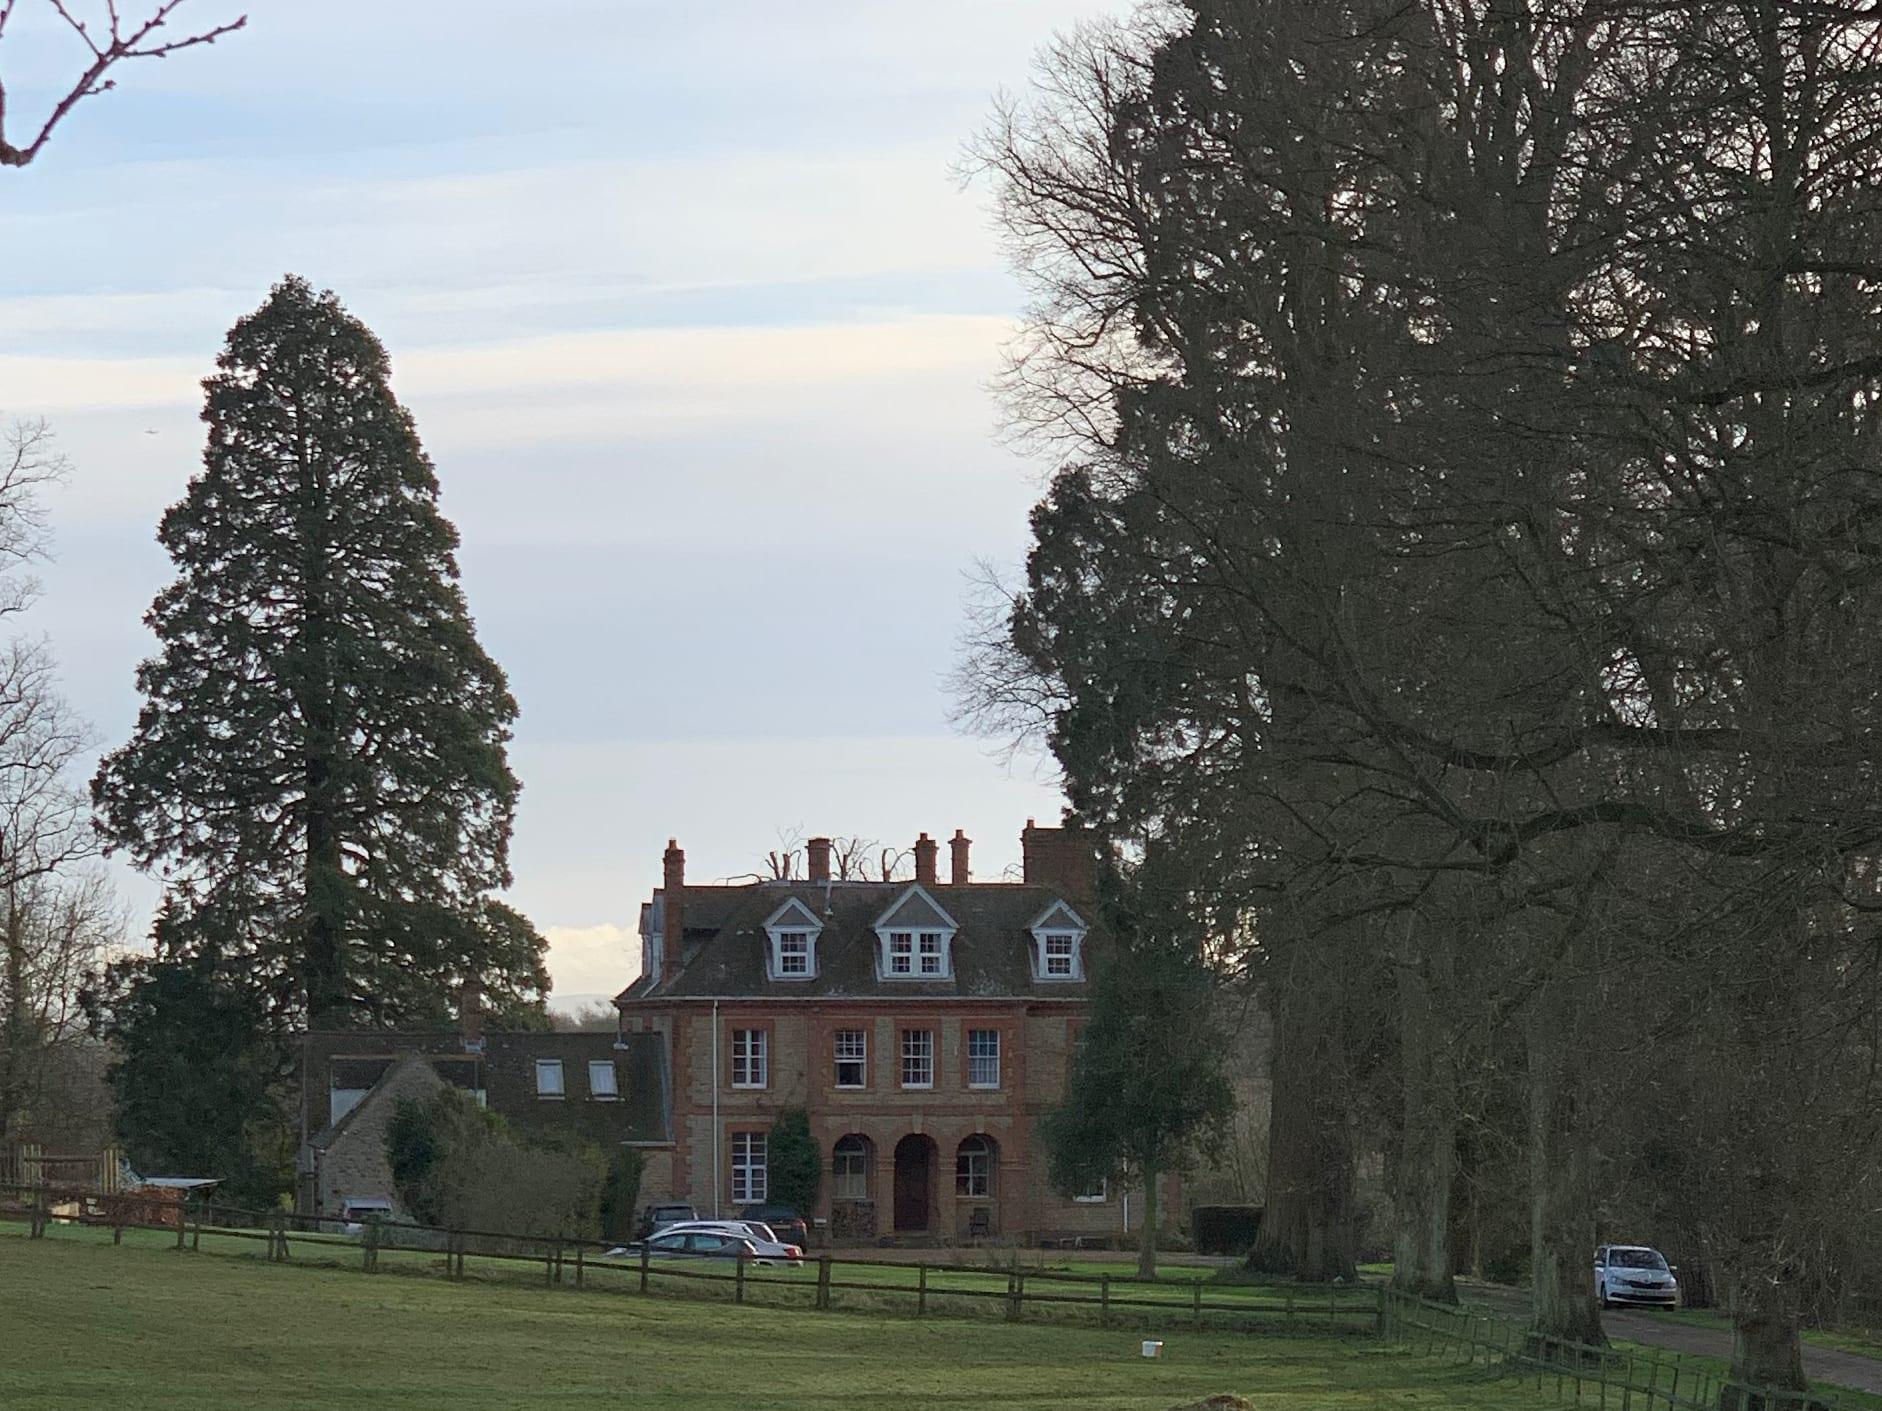 Stanton House web image